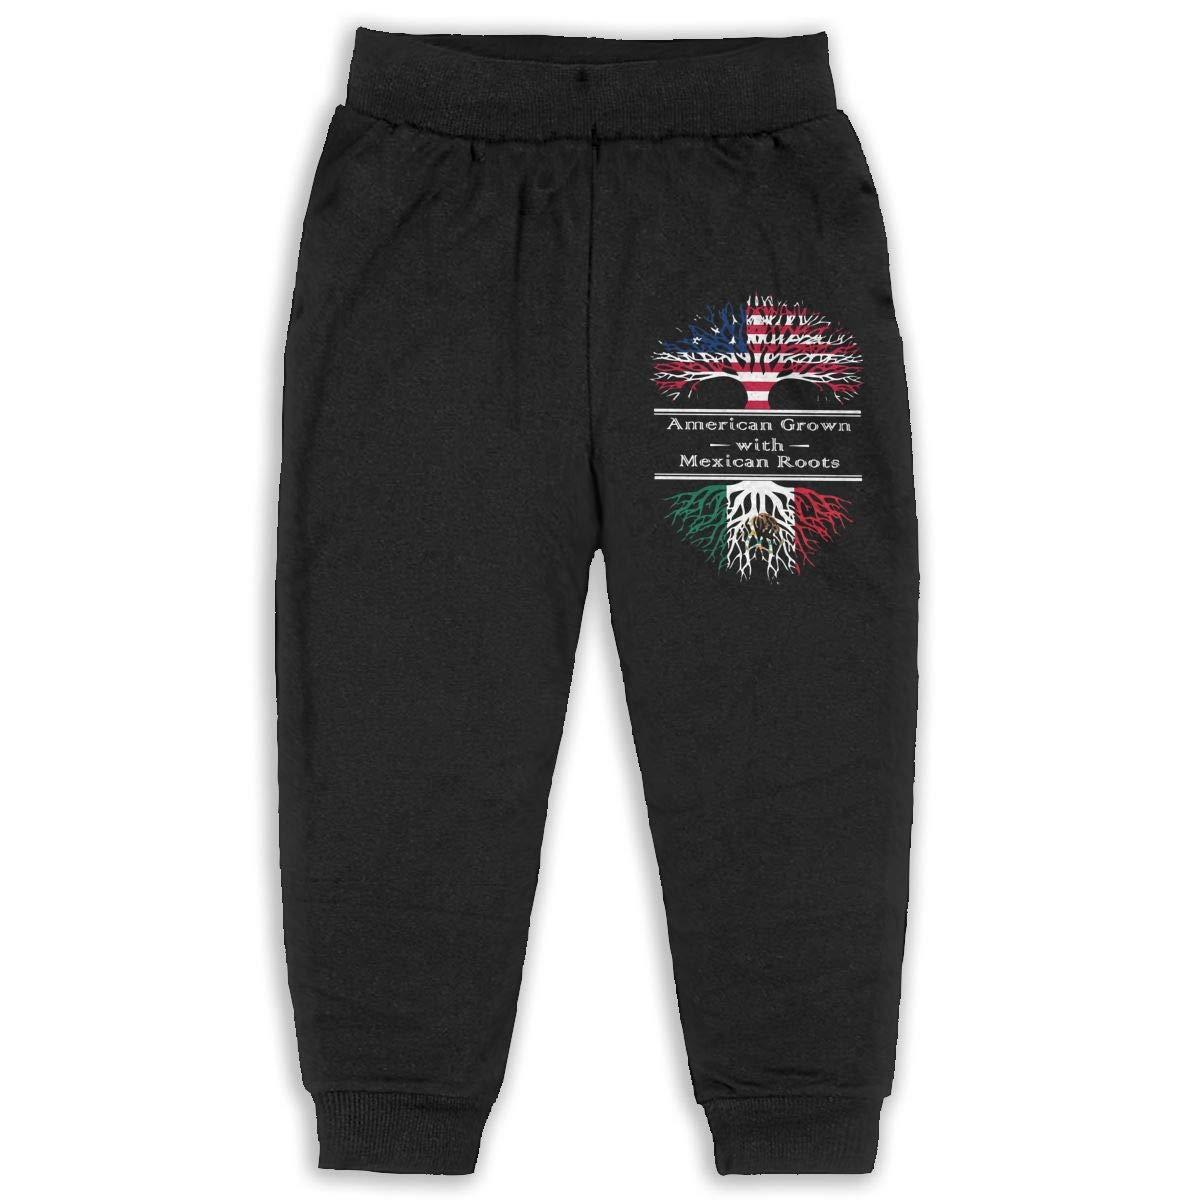 Soft Cozy Girls Boys Elastic Trousers Udyi/&Jln-97 American Grown Irish Roots Unisex Baby Sweatpants